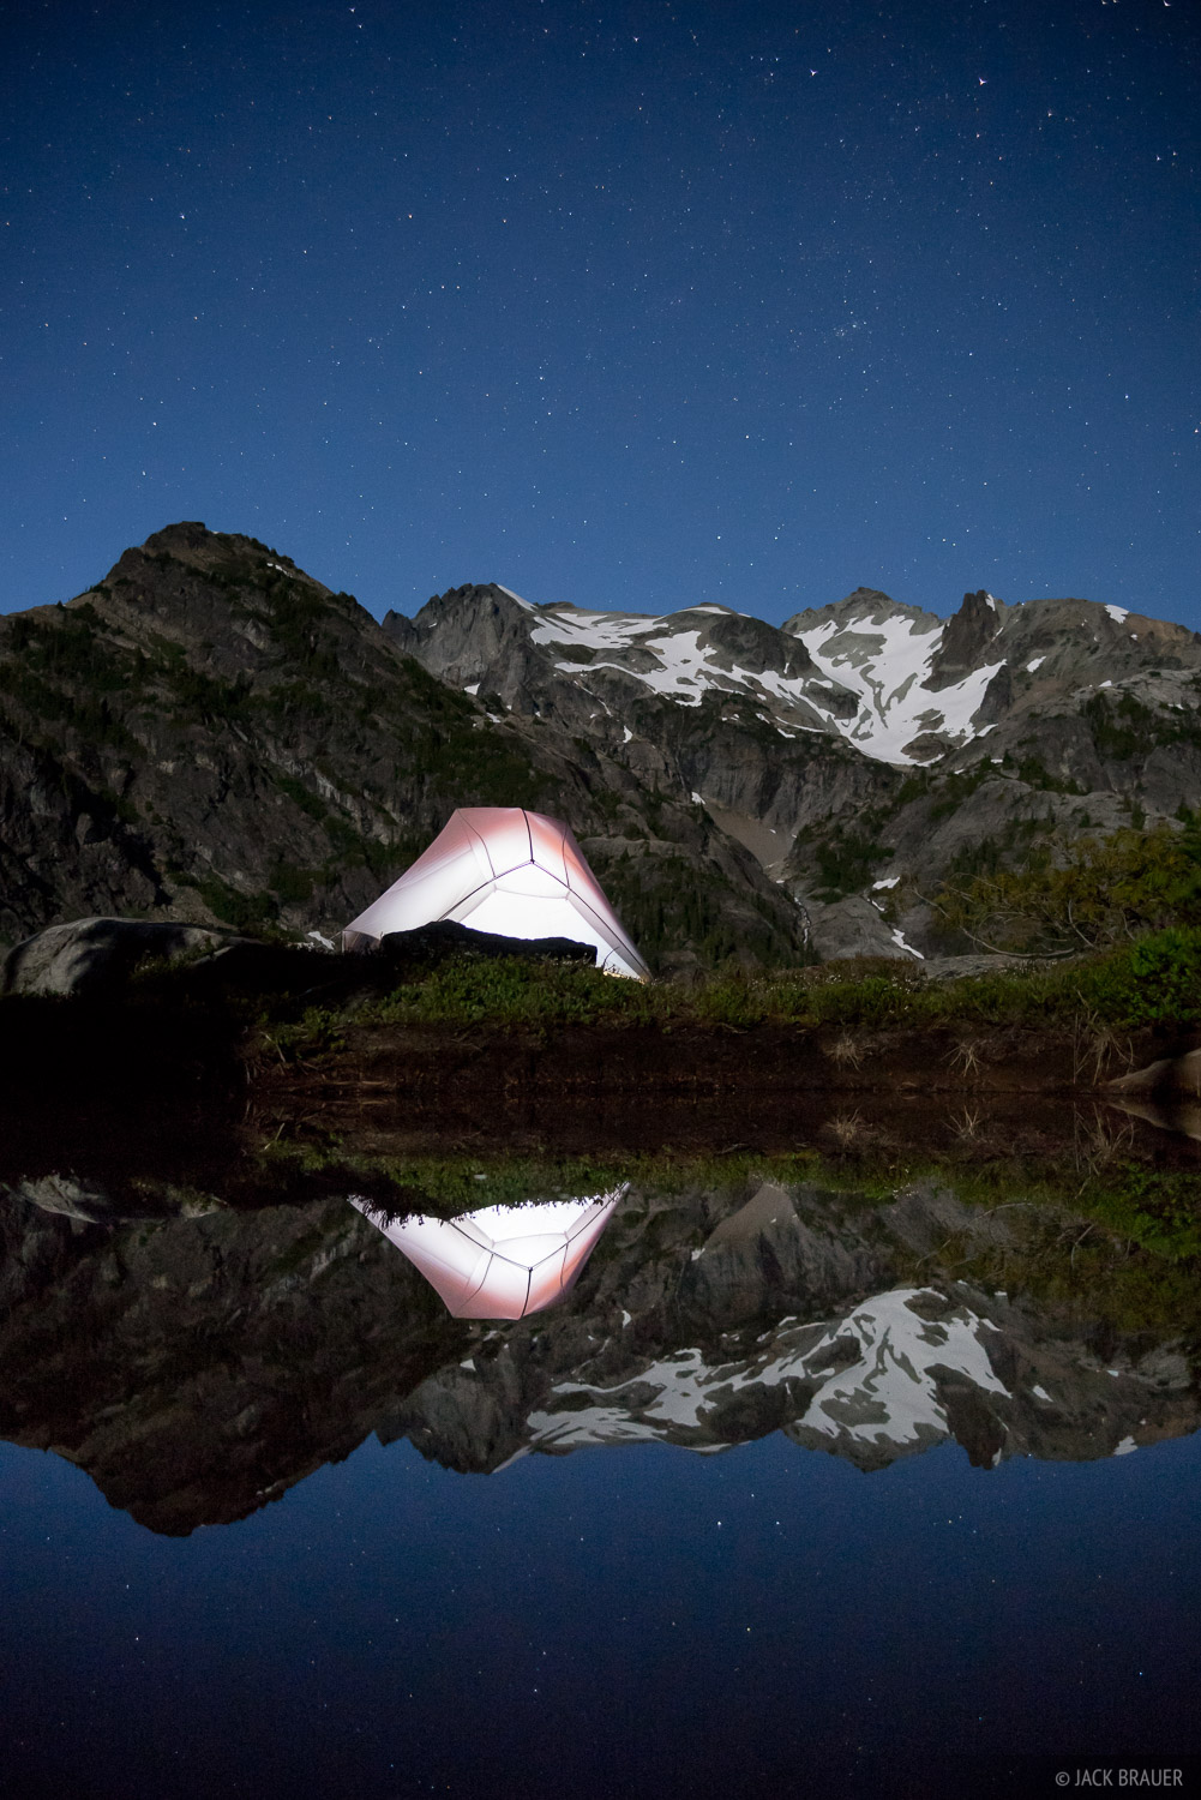 Alpine Lakes Wilderness, Mount Daniel, Spade Lake, Washington, moonlight, tent, Cascades